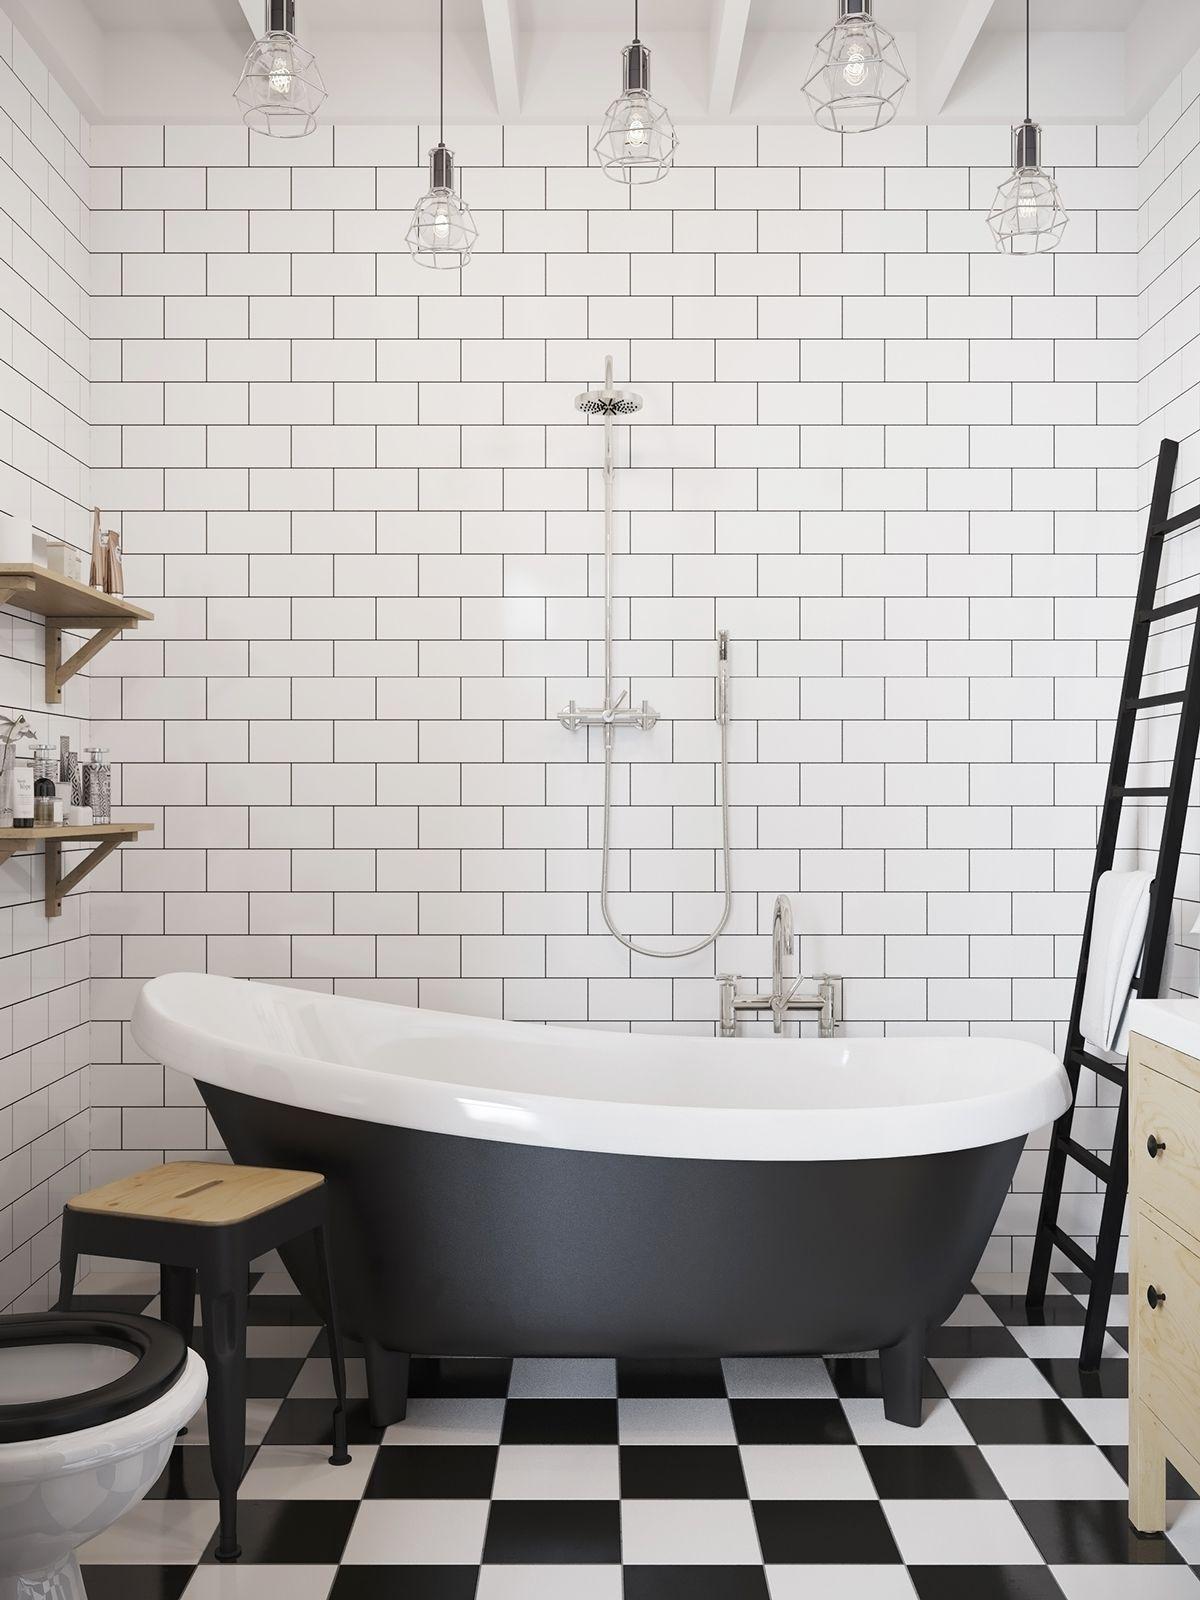 Rustikale badezimmerdekorideen schickes skandinavisches studioapartmentdesign mit loftbett das